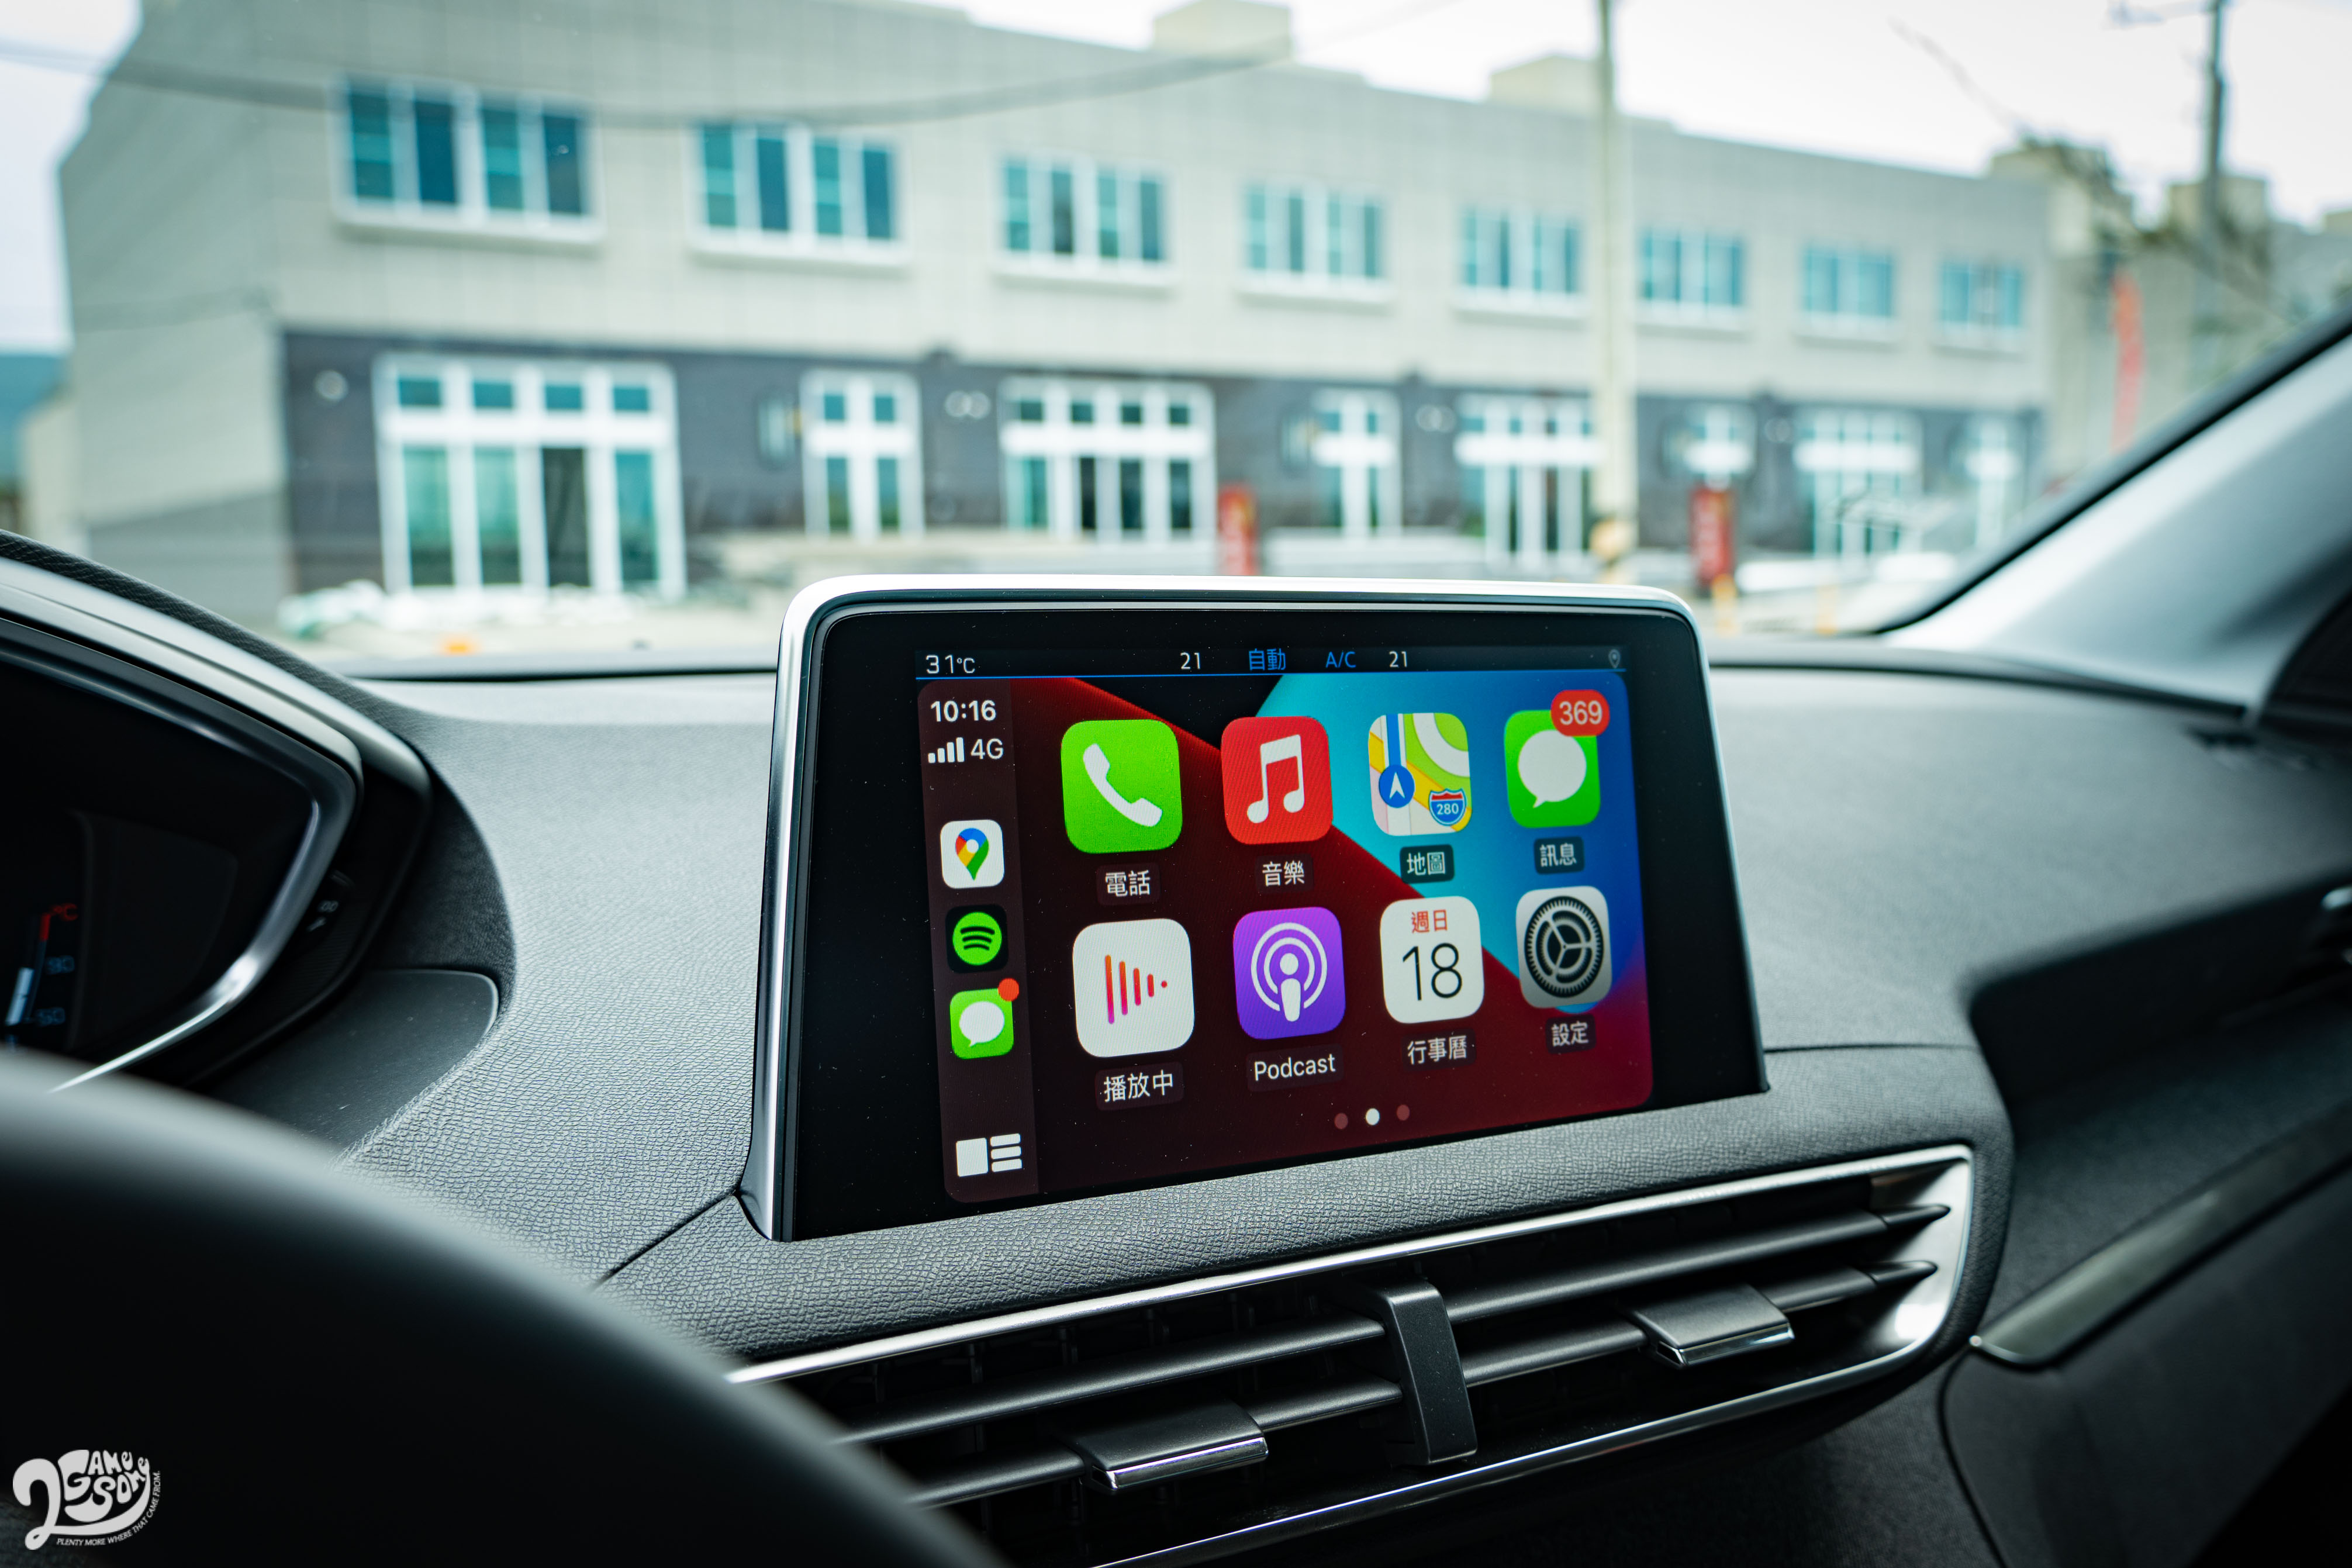 3008 全車系標配 Apple CarPlay 、Android Auto 和 MirrorLink,透過 8 吋全彩觸控螢幕使用。